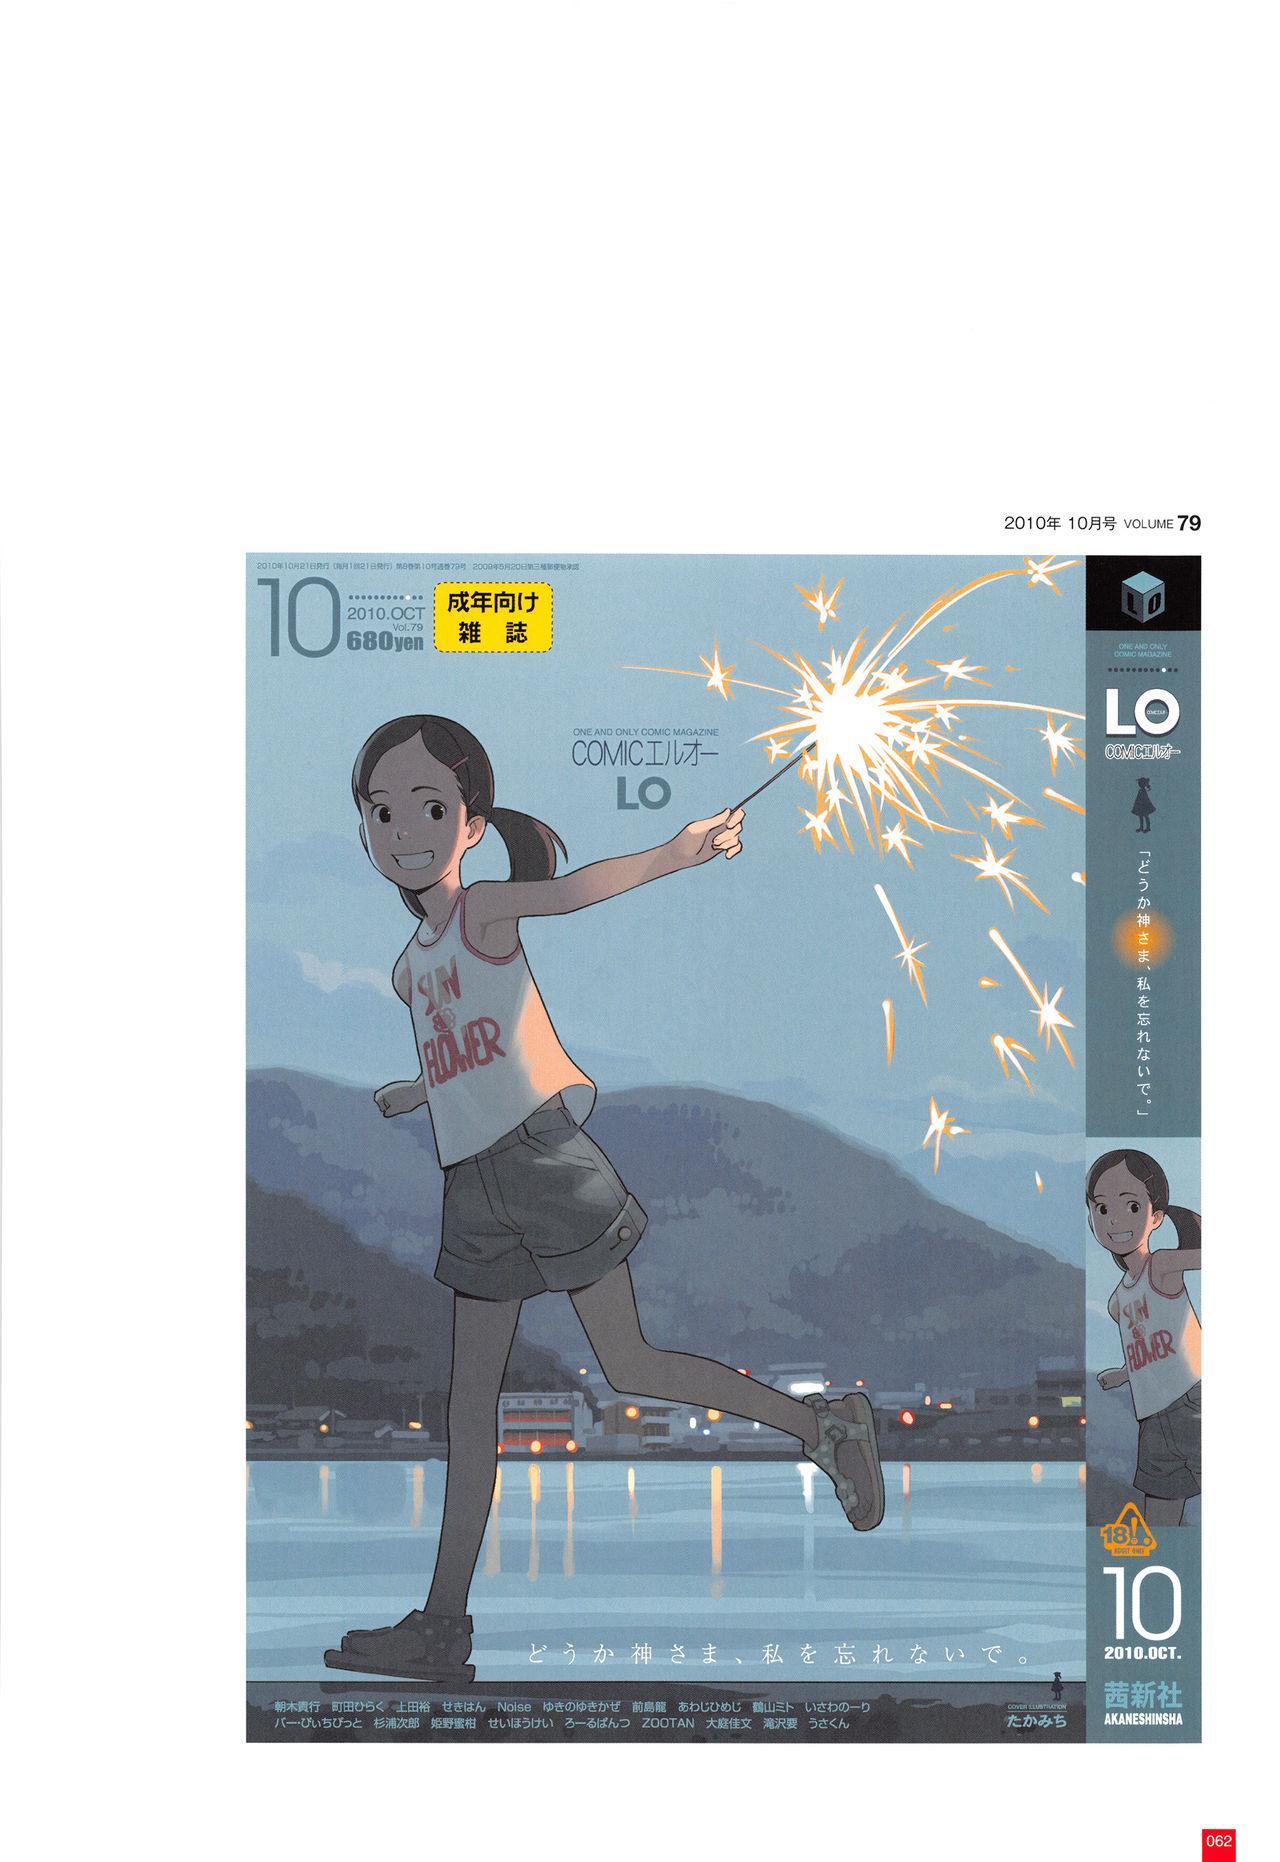 LO Artbook 2-A TAKAMICHI LOOP WORKS 64